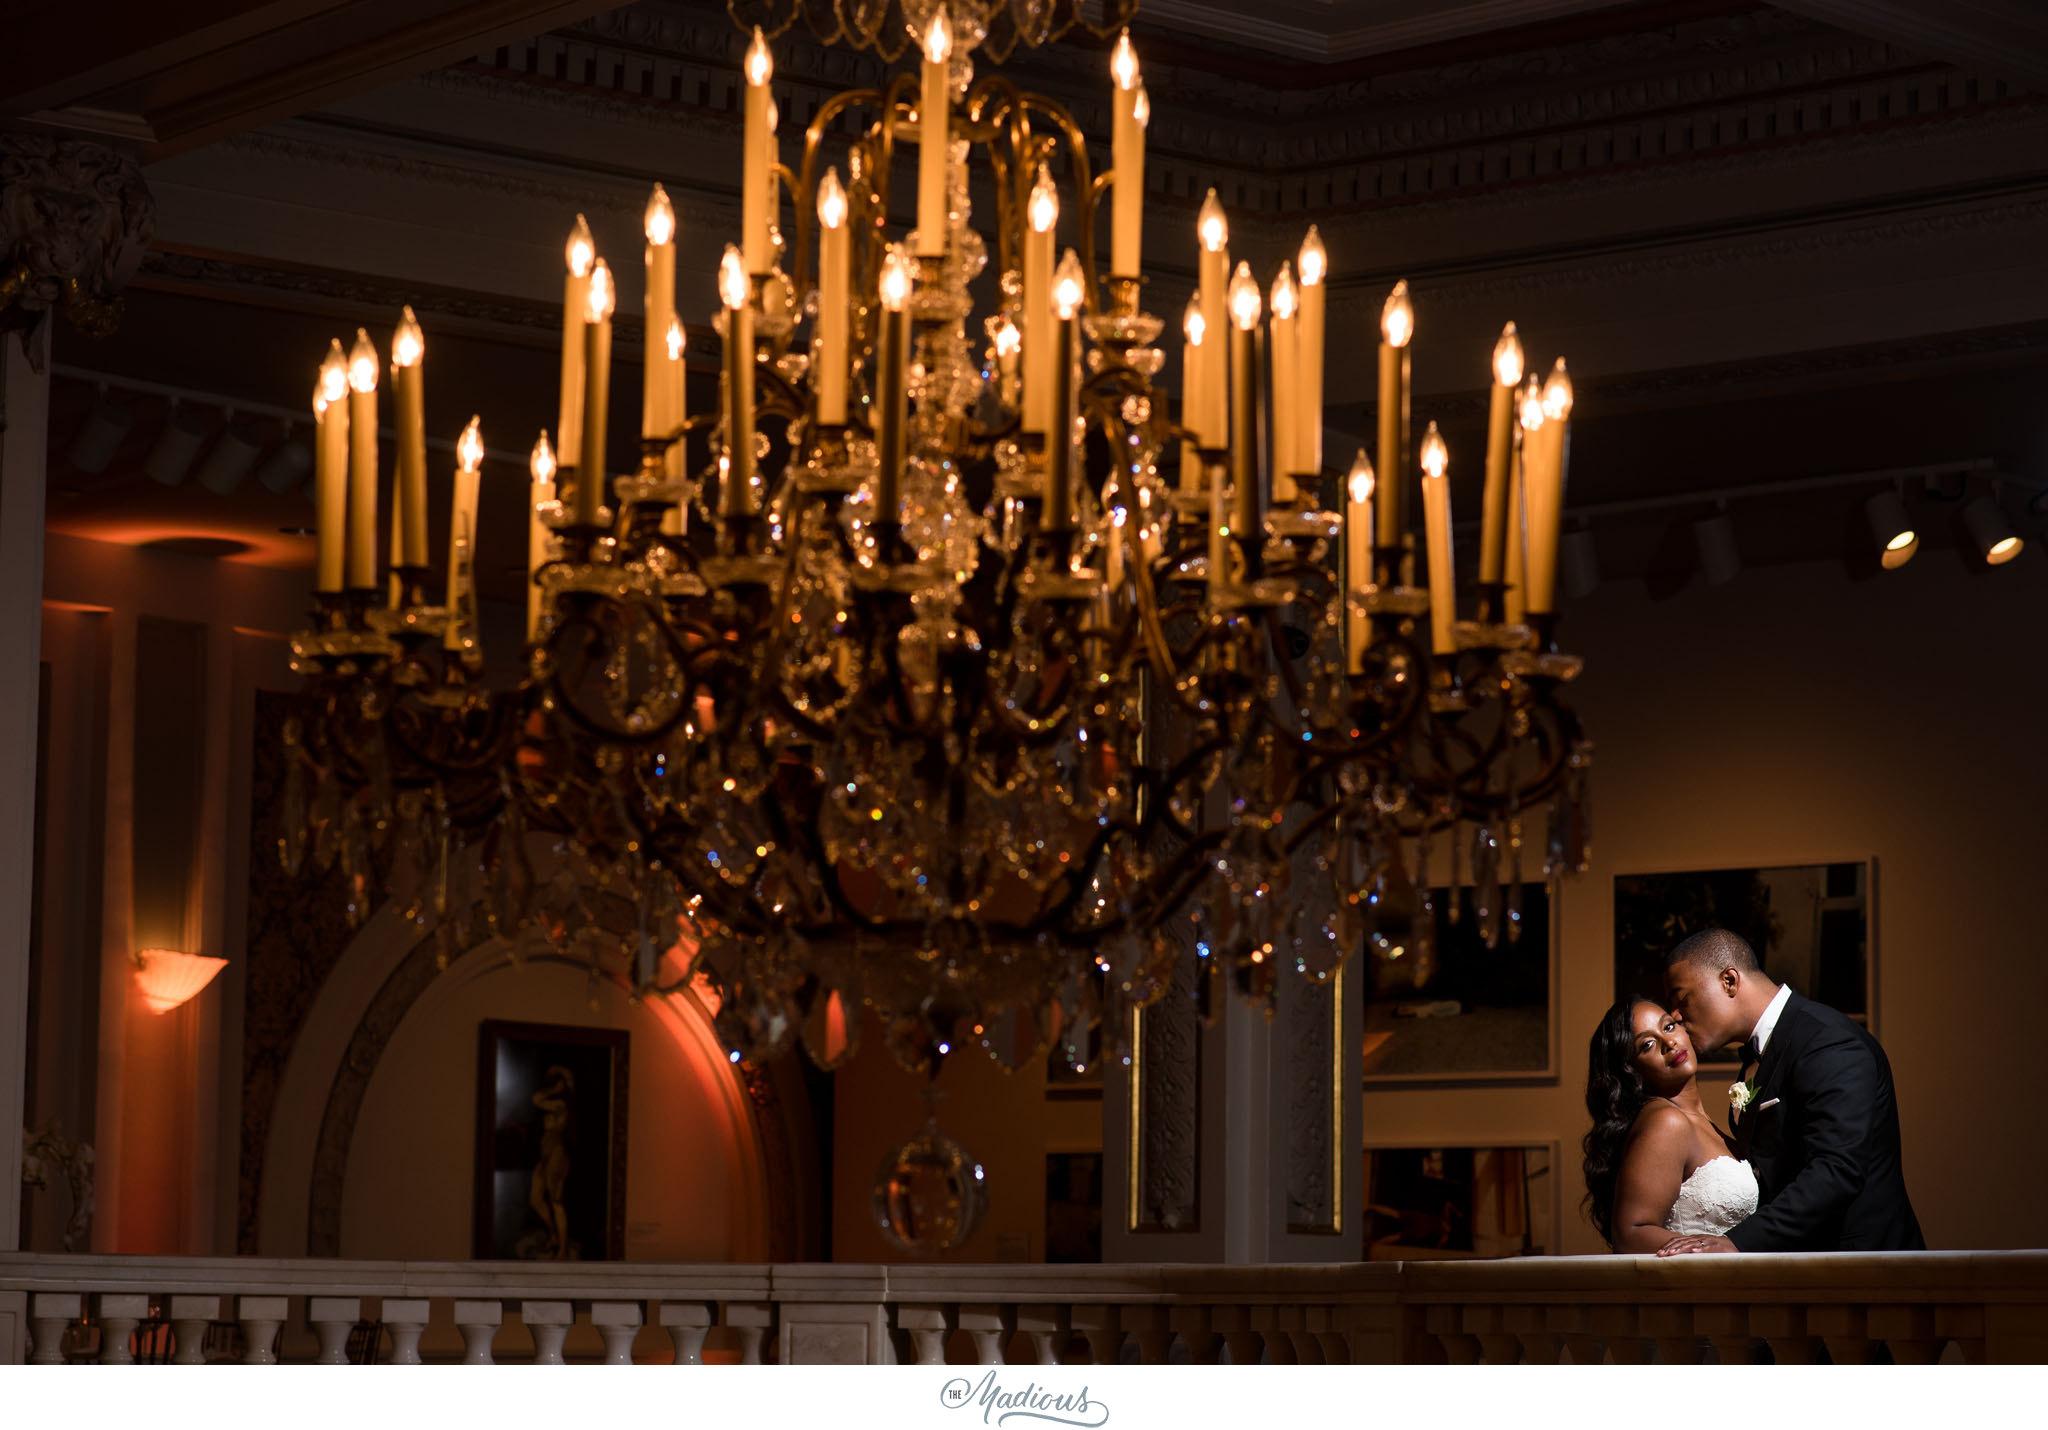 nmwa+wedding,+women+in+the+arts+wedding,+ethiopian+wedding,+dc+wedding+0162.jpg